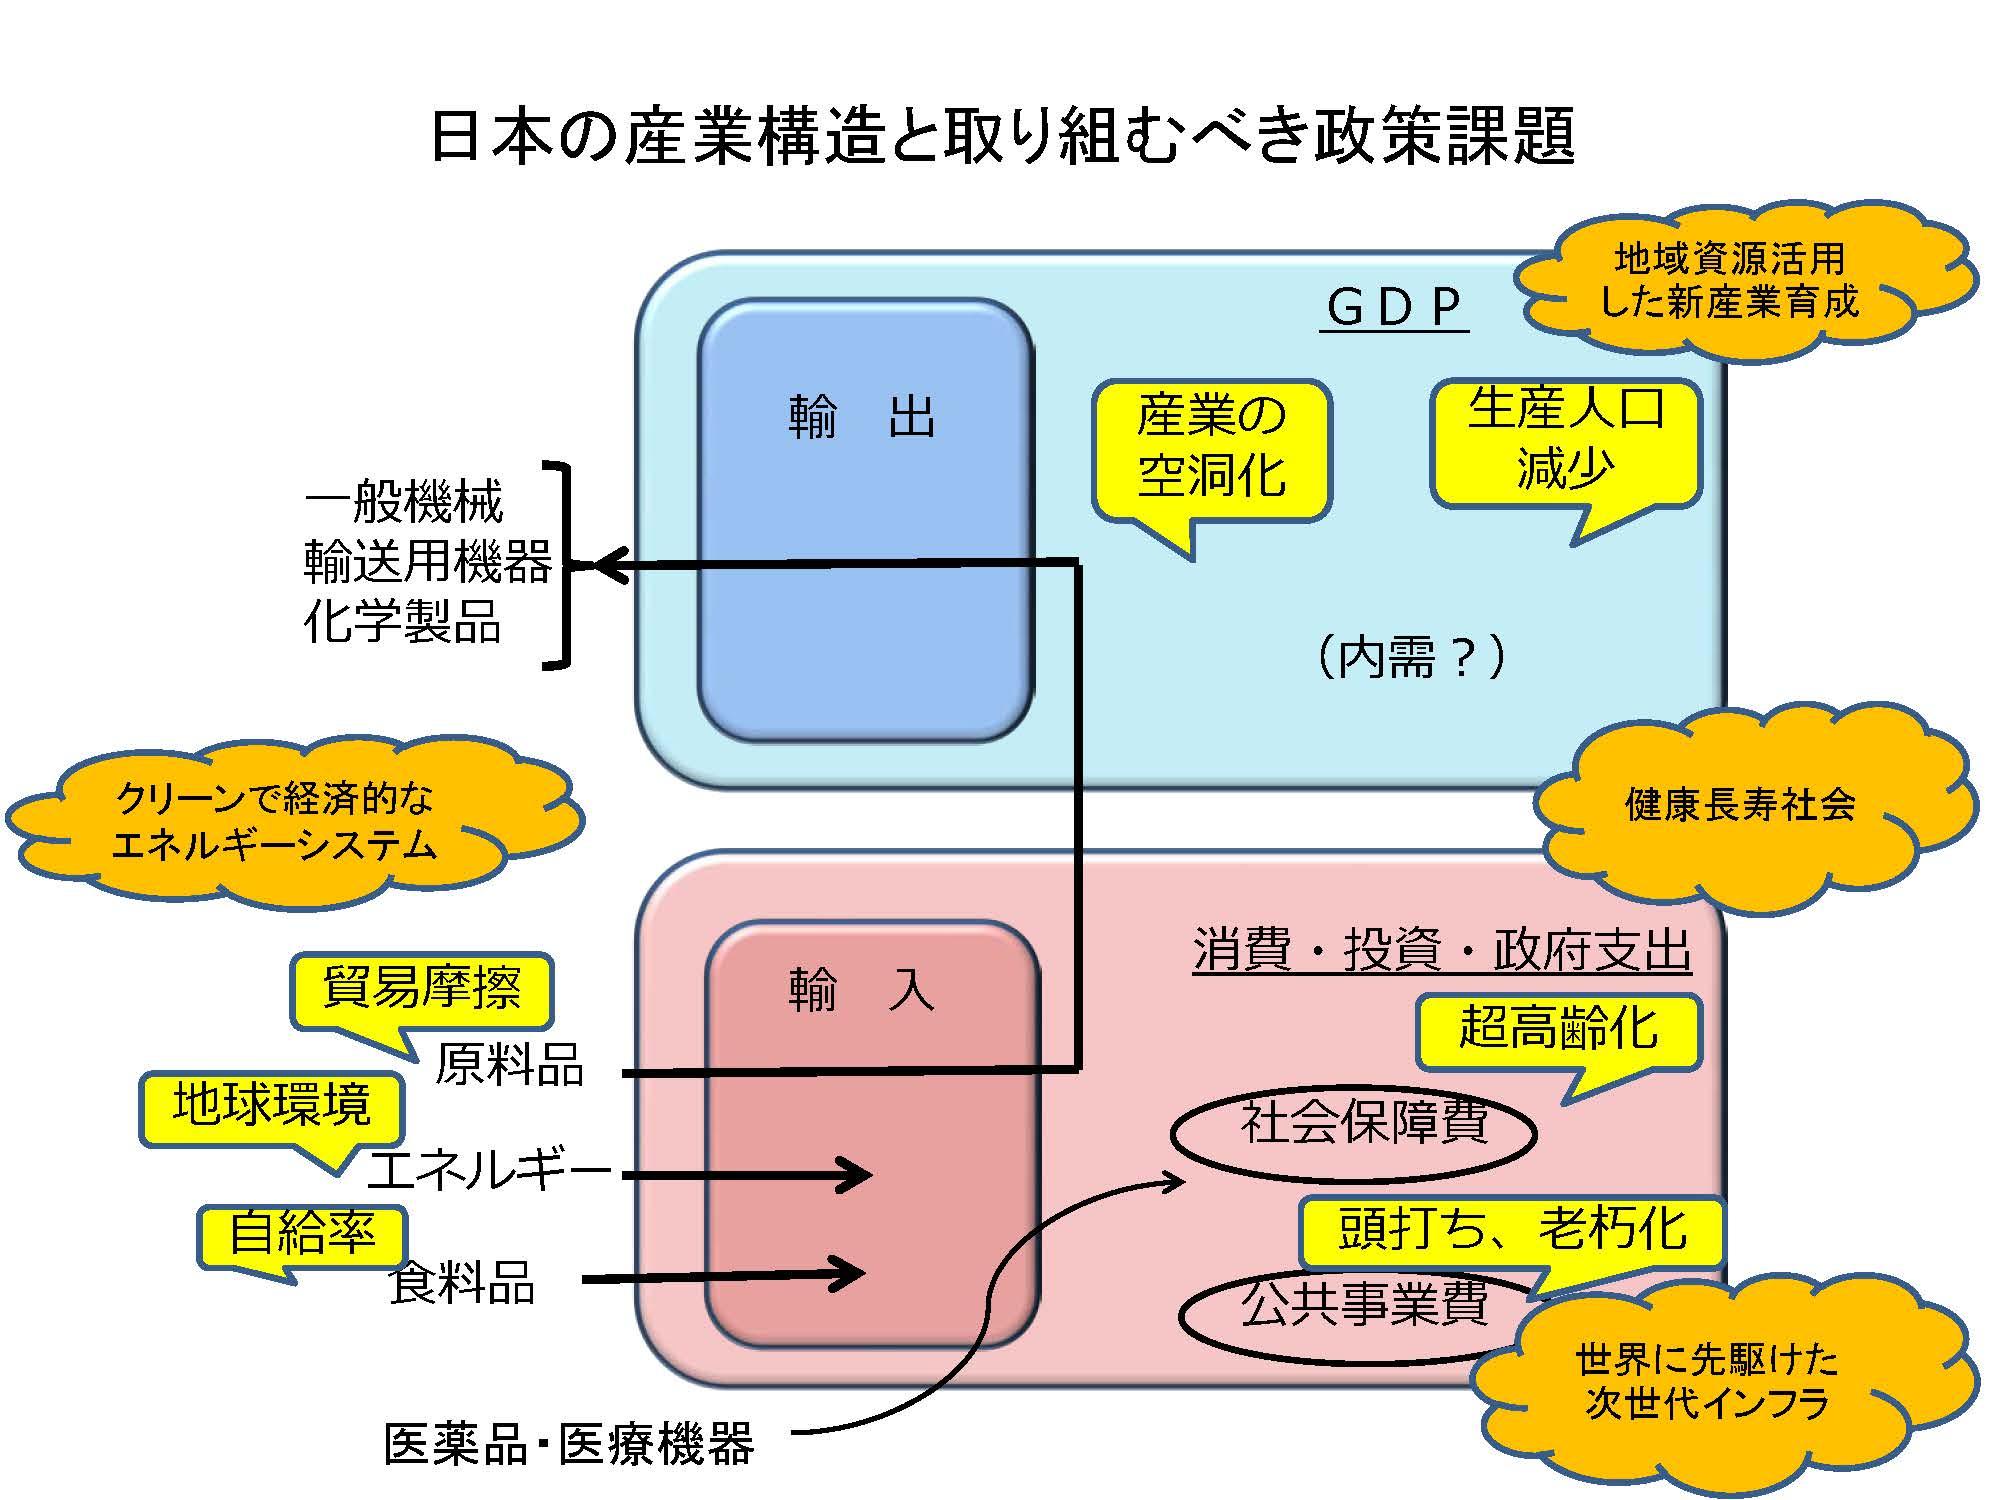 tanaka_hiroshi_01.jpg